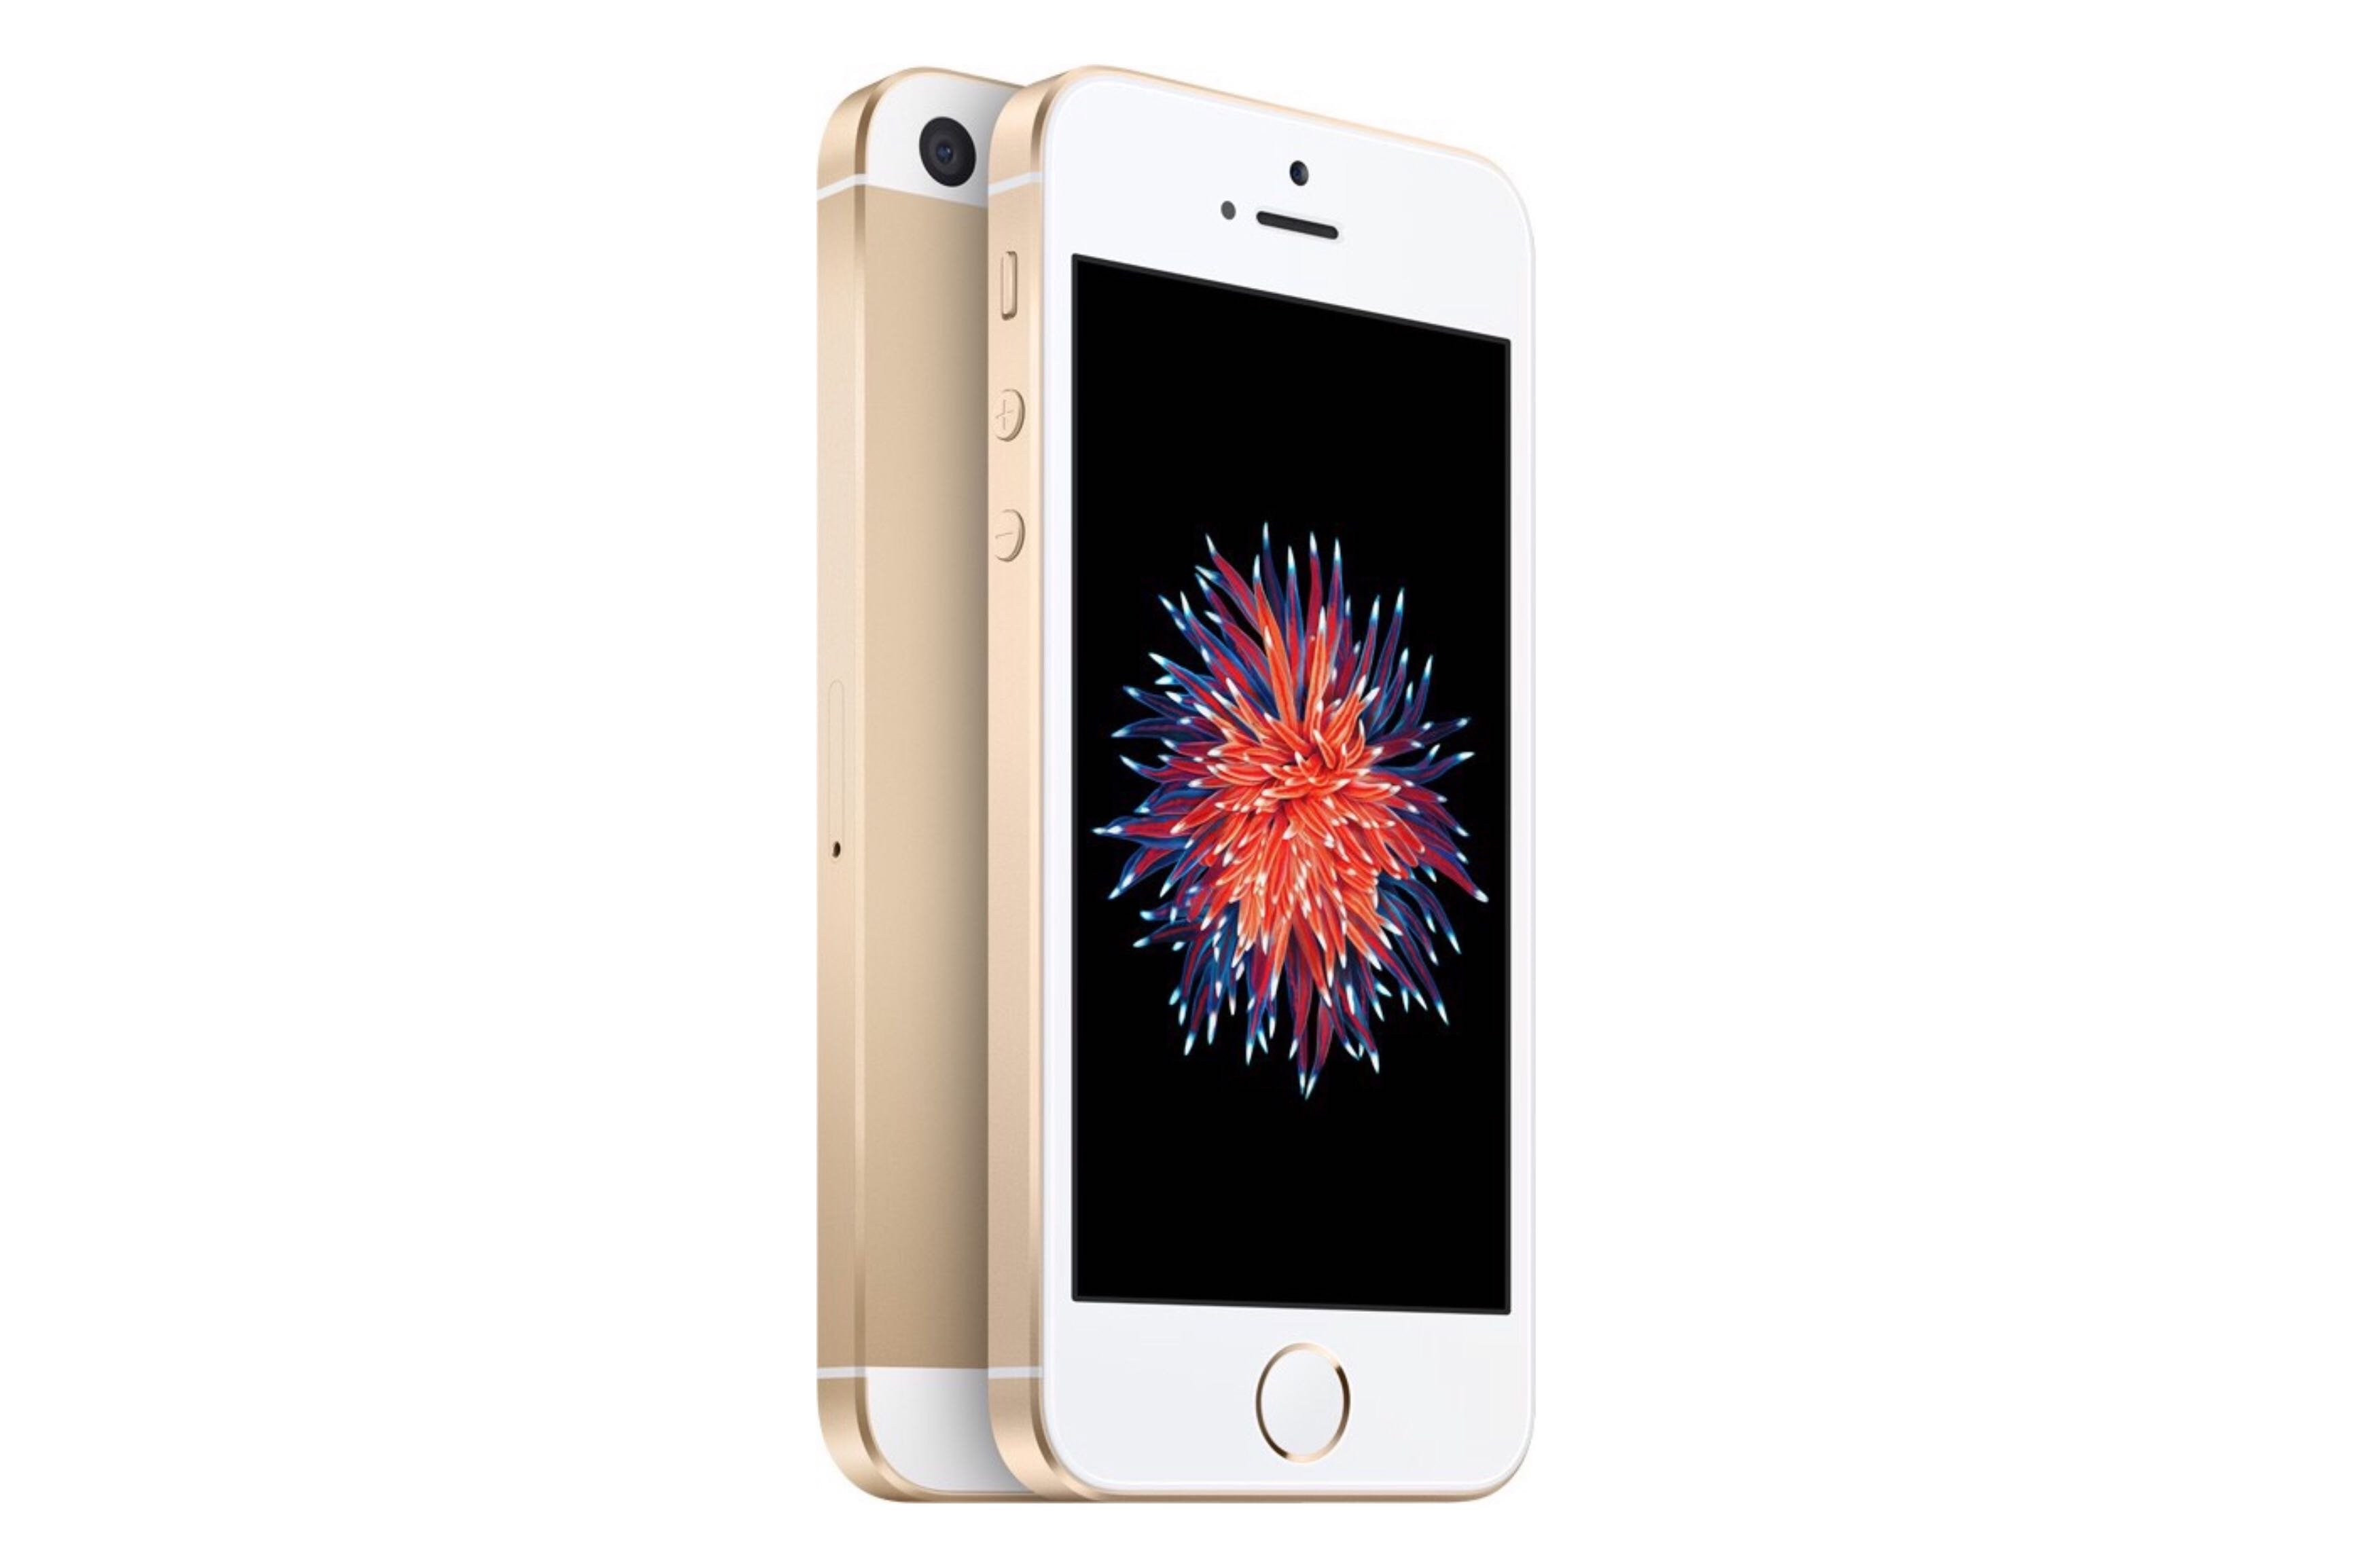 auオンラインショップのiPhone SE